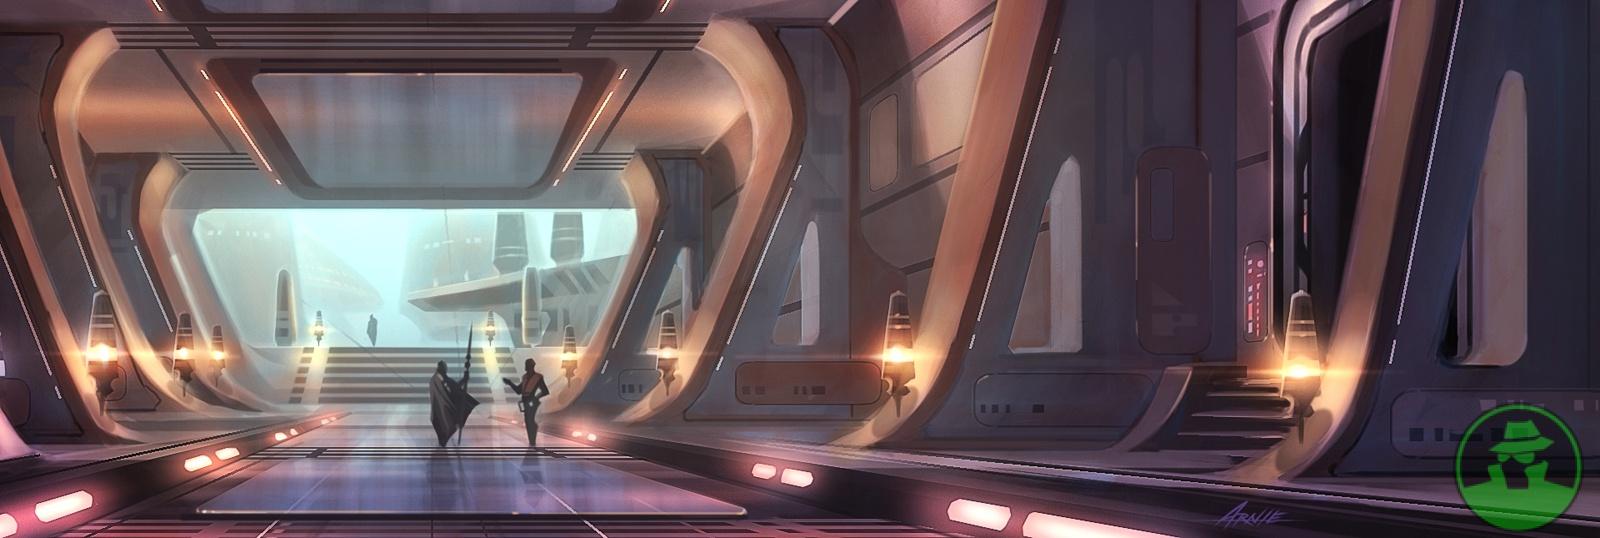 Scénario 4 : Edenia Star-wars-the-old-republic-20081021011800925